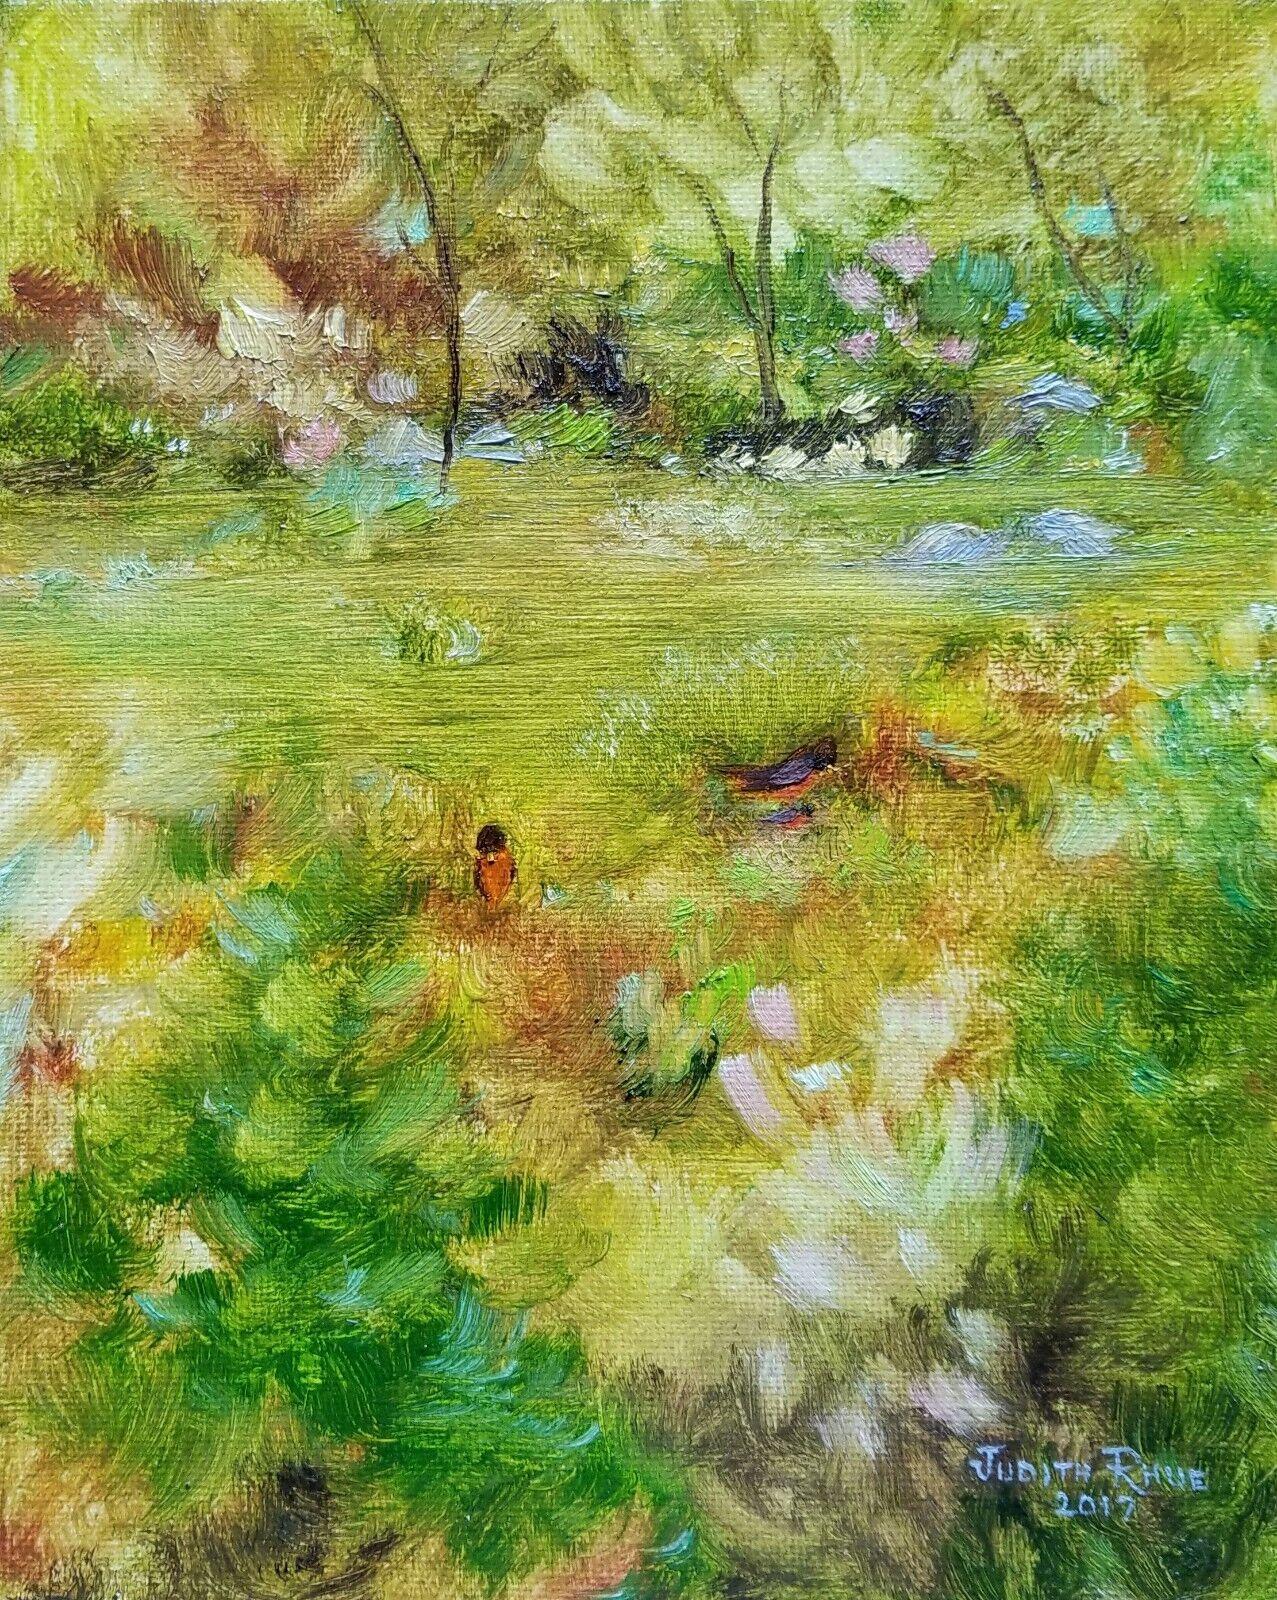 Original Oil Painting Landscape Robin Spring Trees Bird 8 x10 Canvas Signed Art - $100.00